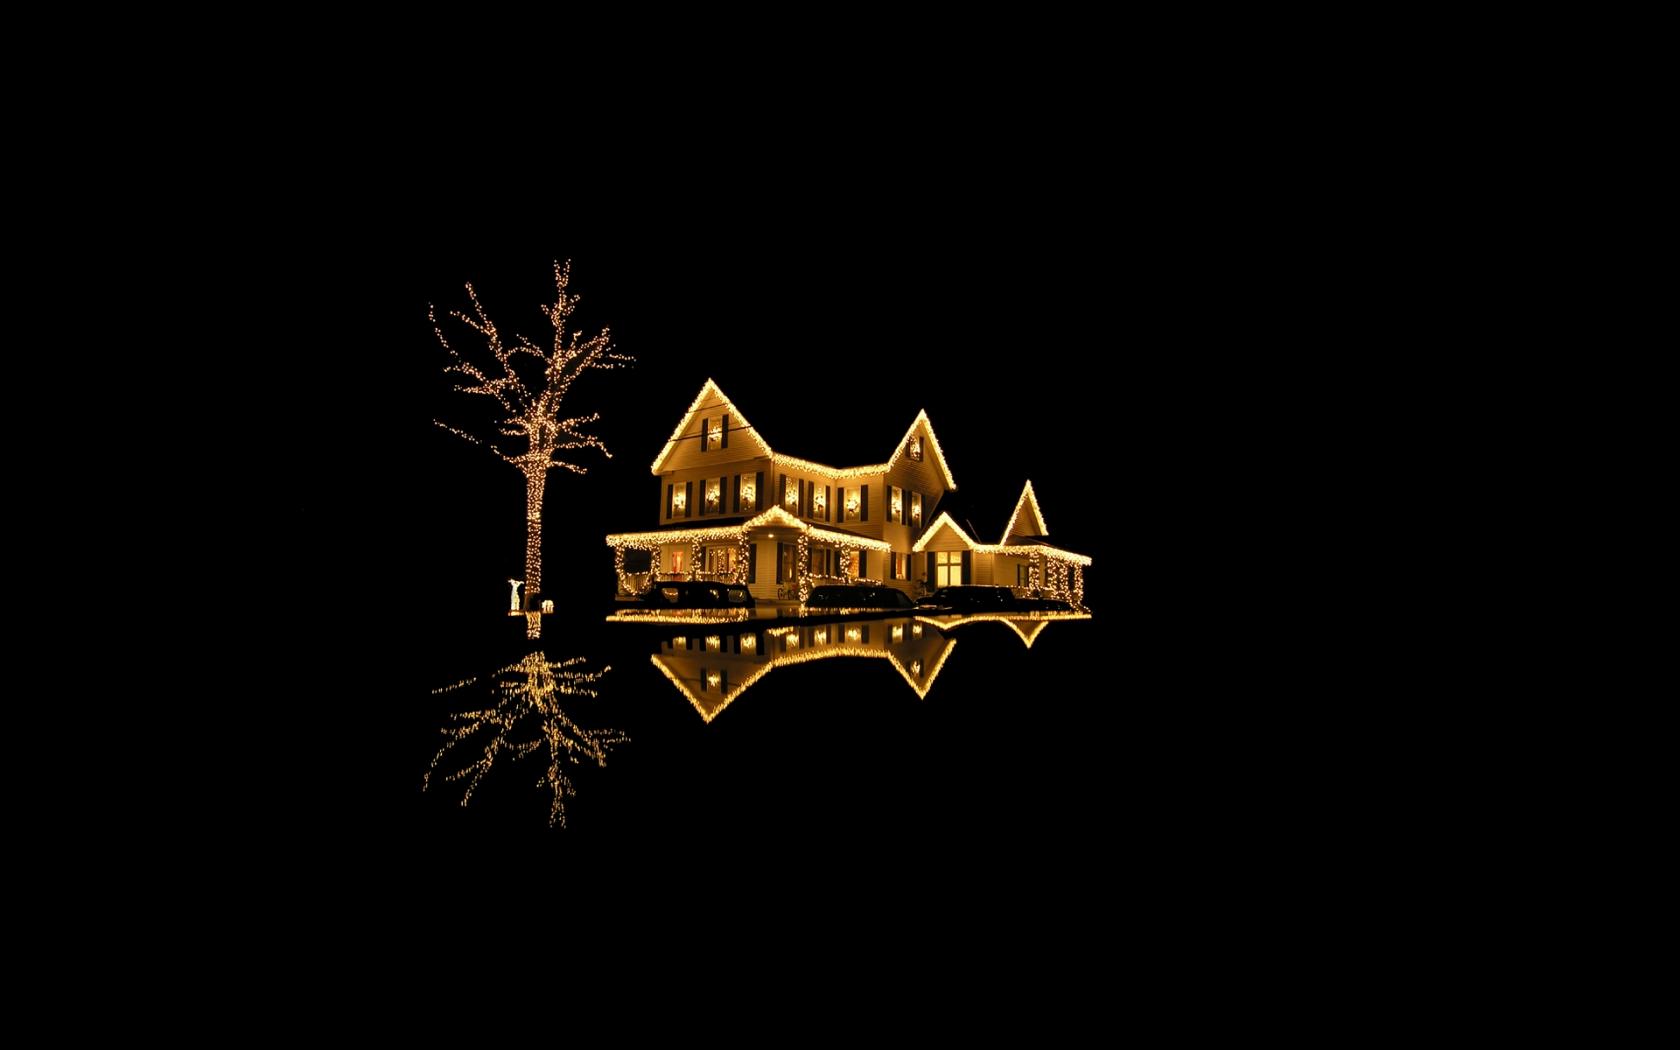 Fondo negro con casa con luces de navidad - 1680x1050